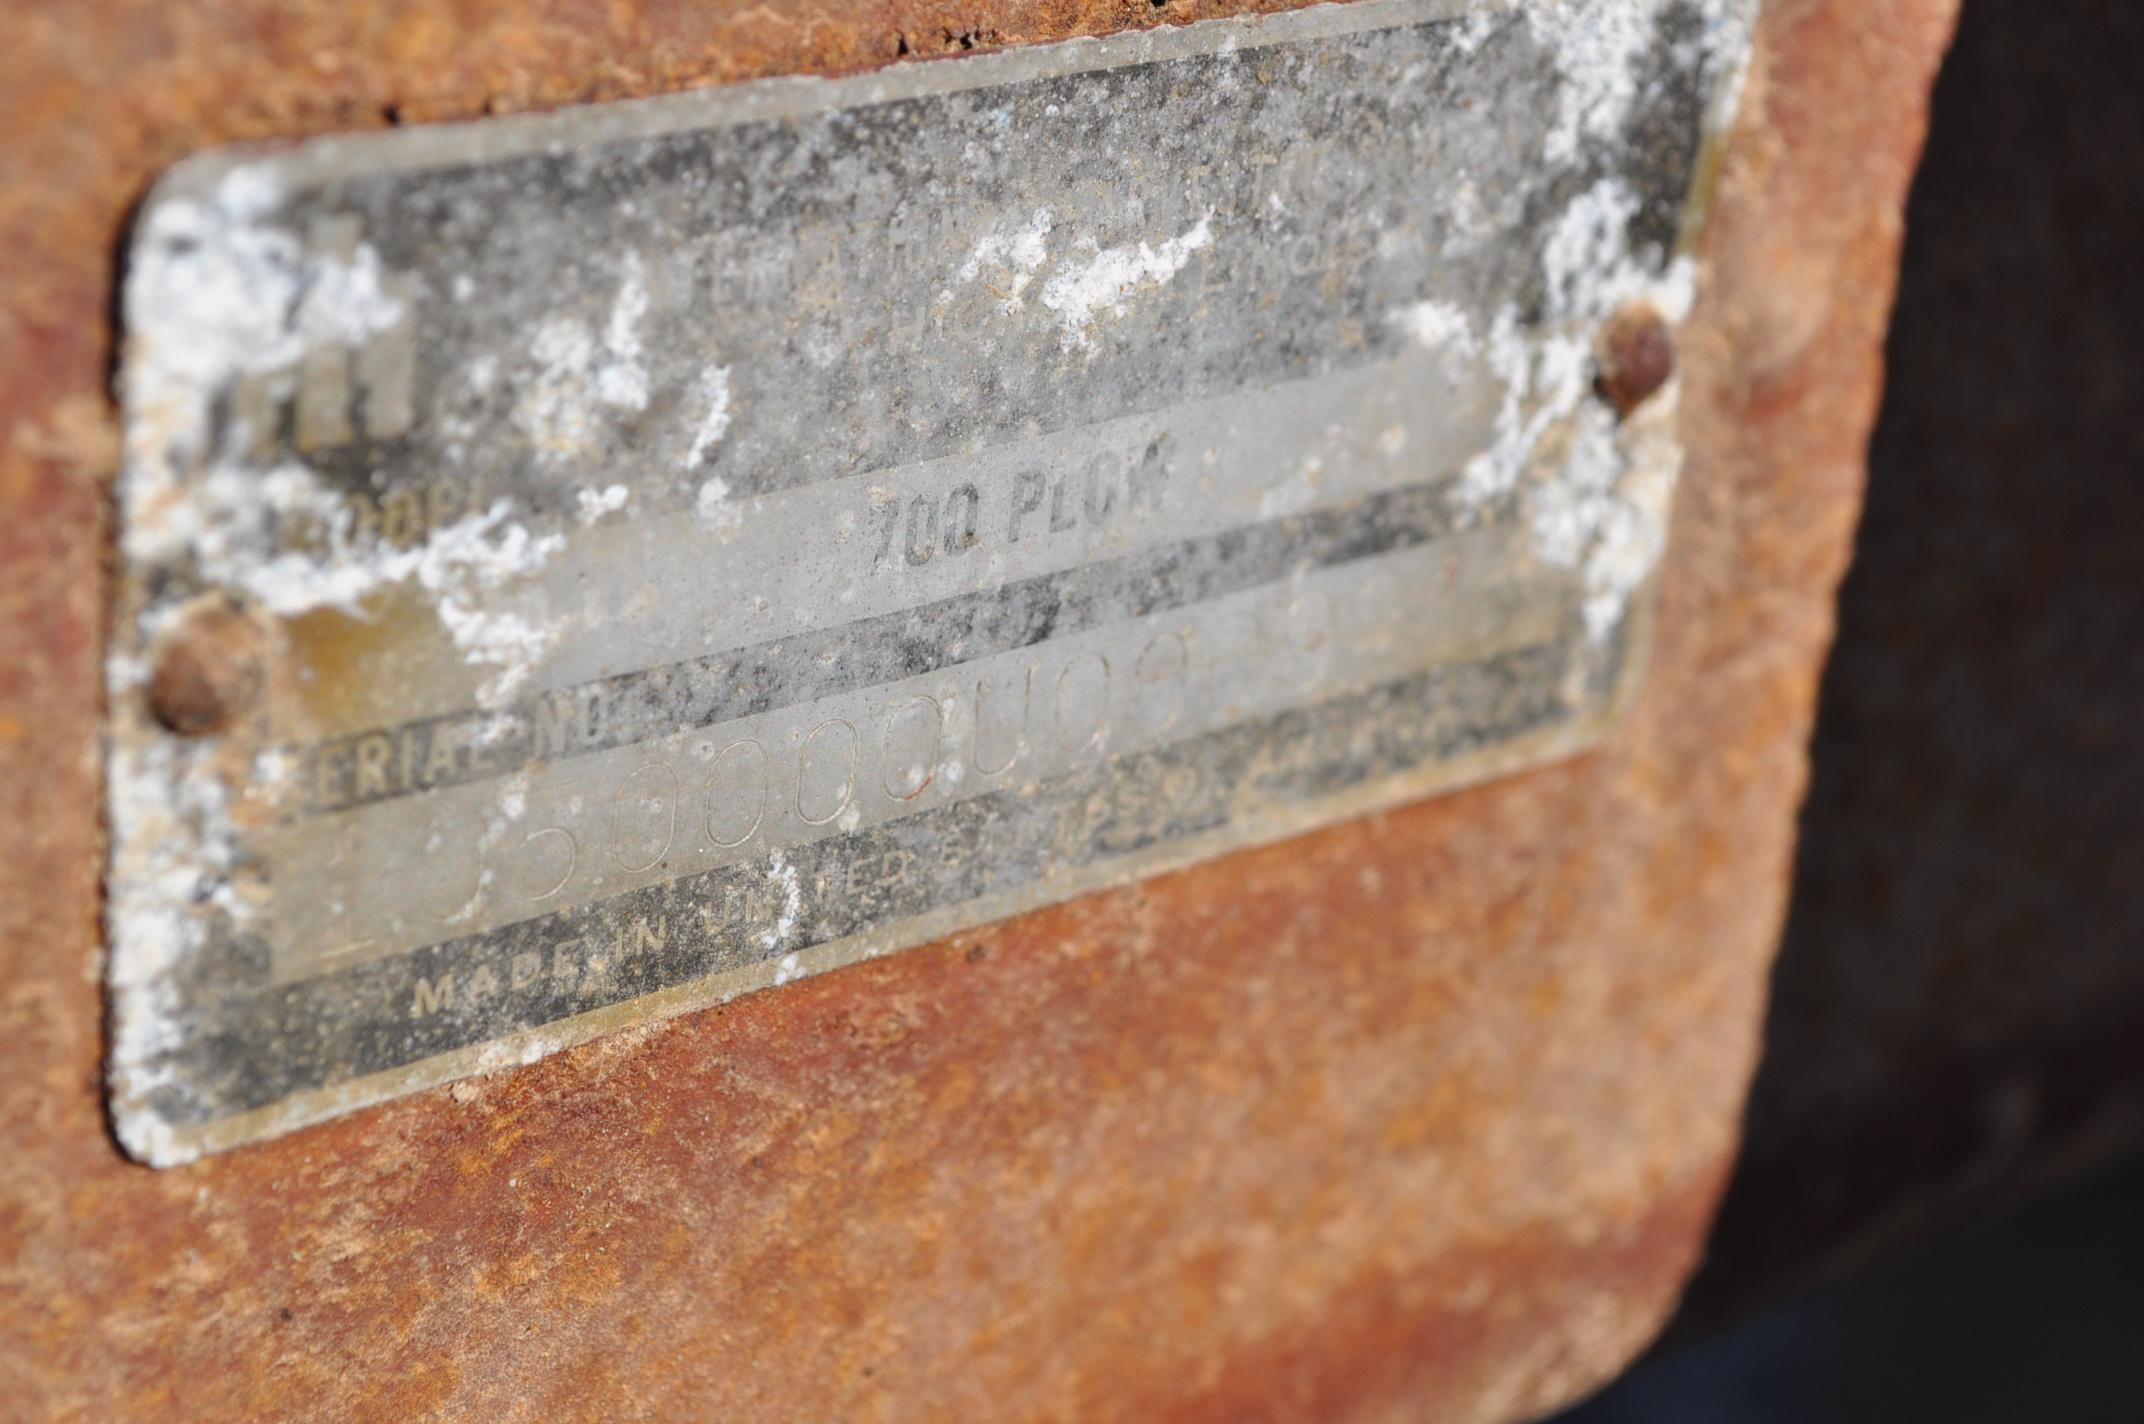 International 700 onland moldboard plow, 7 btm, auto reset trip - Image 16 of 16